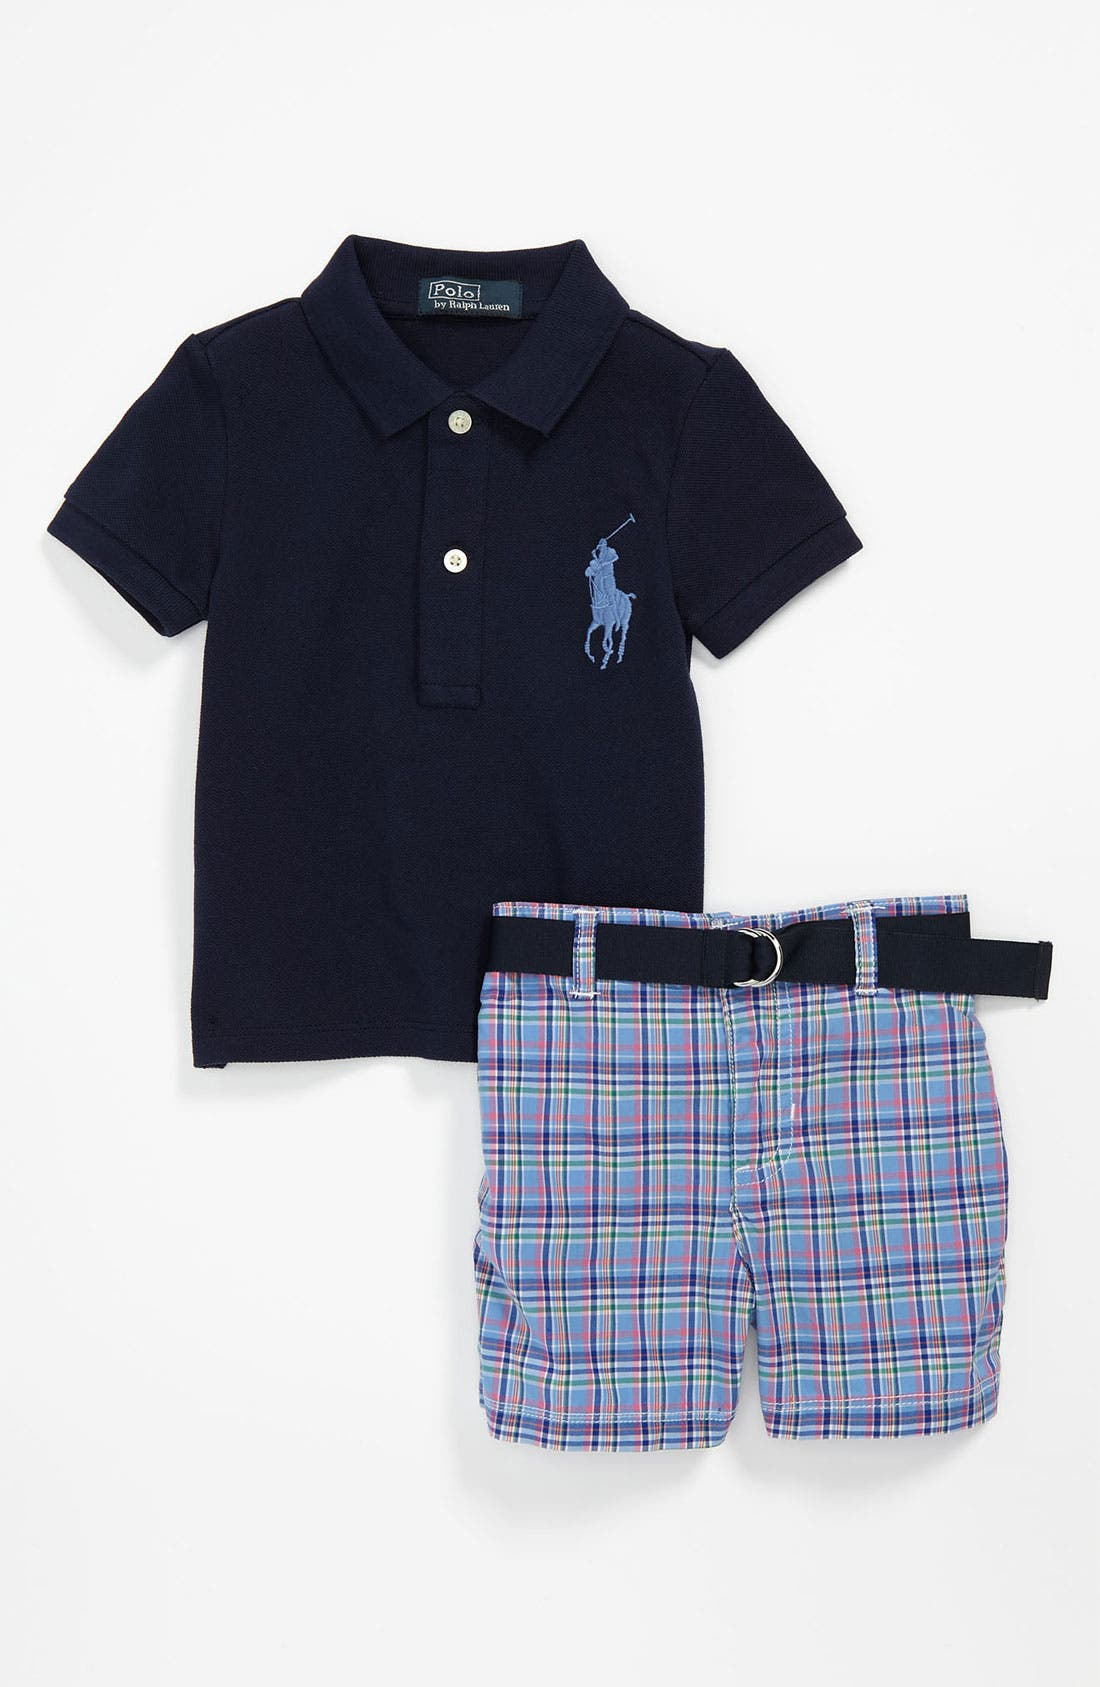 Alternate Image 1 Selected - Ralph Lauren Polo & Shorts (Infant)